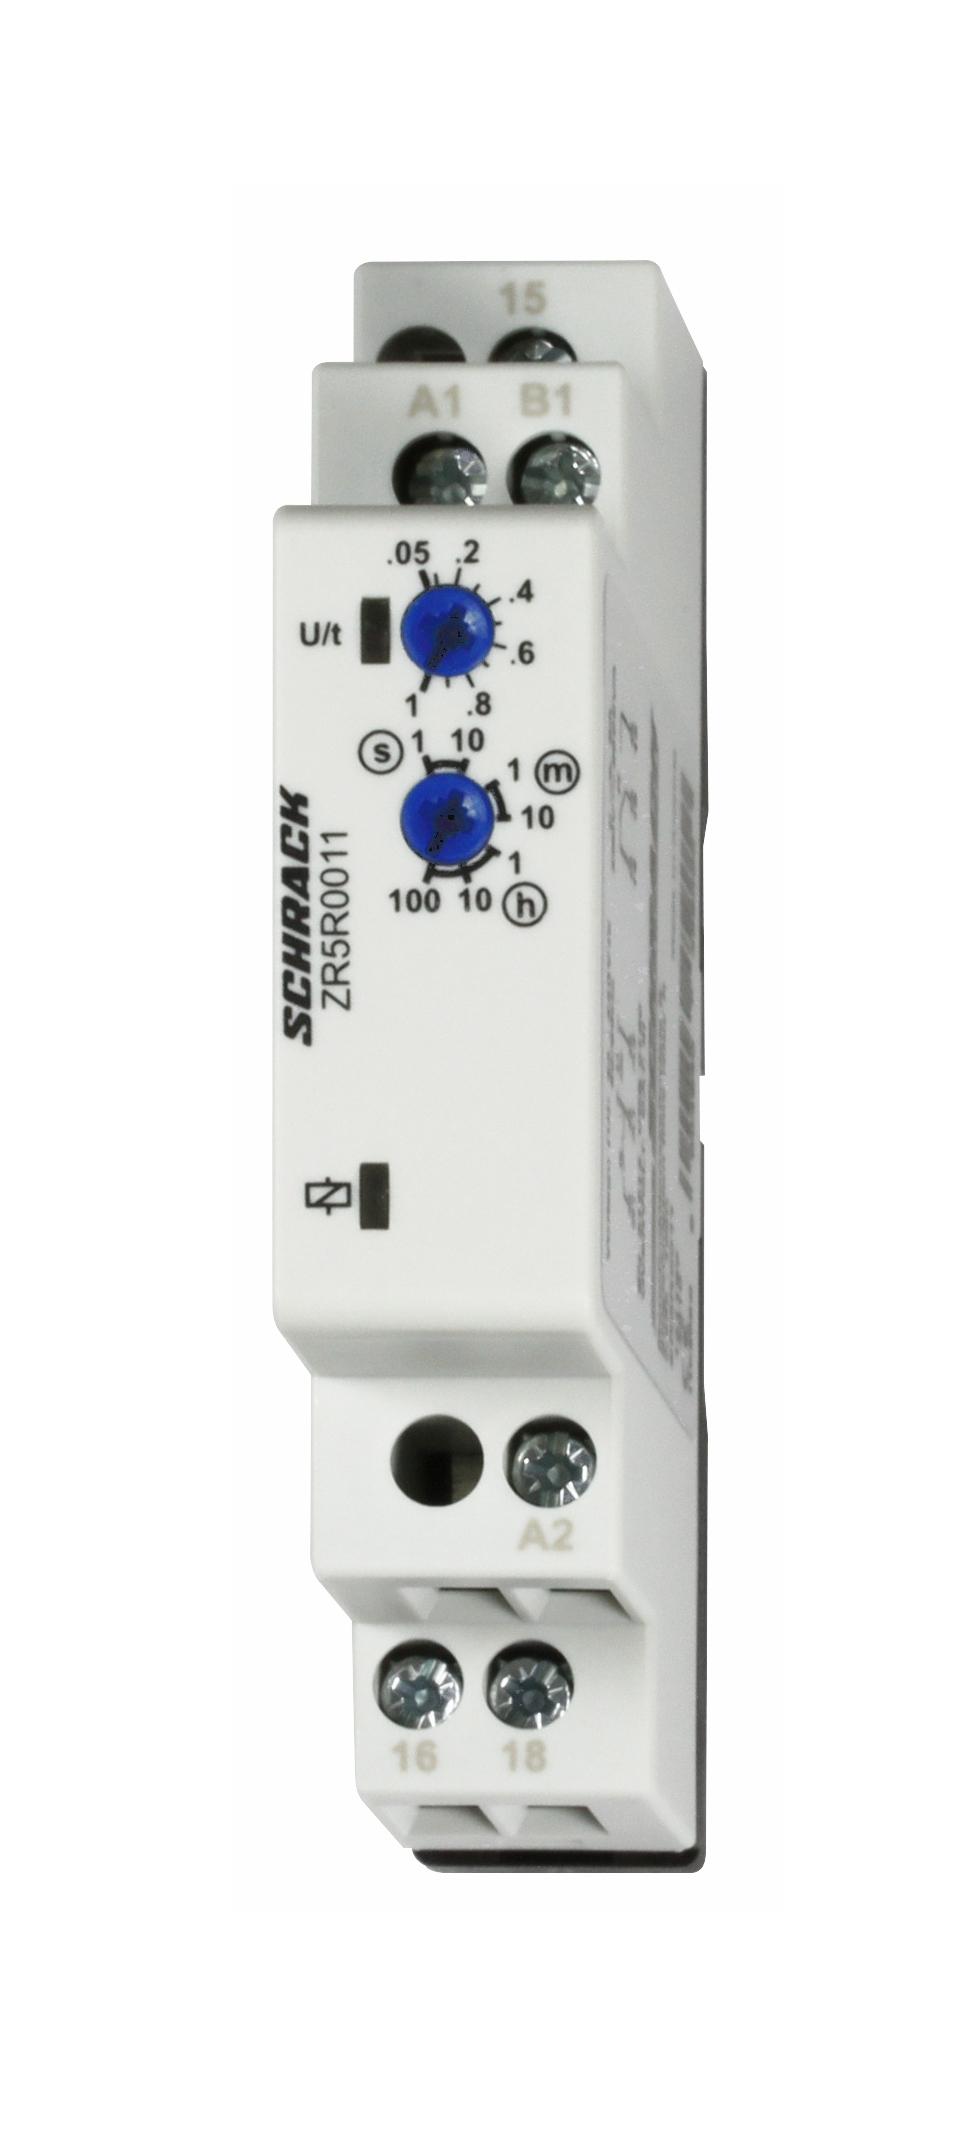 1 Stk Monofunktionsrelais rfv., 24-240V AC/DC, 1 Wechsler, 8A/250V ZR5R0011--